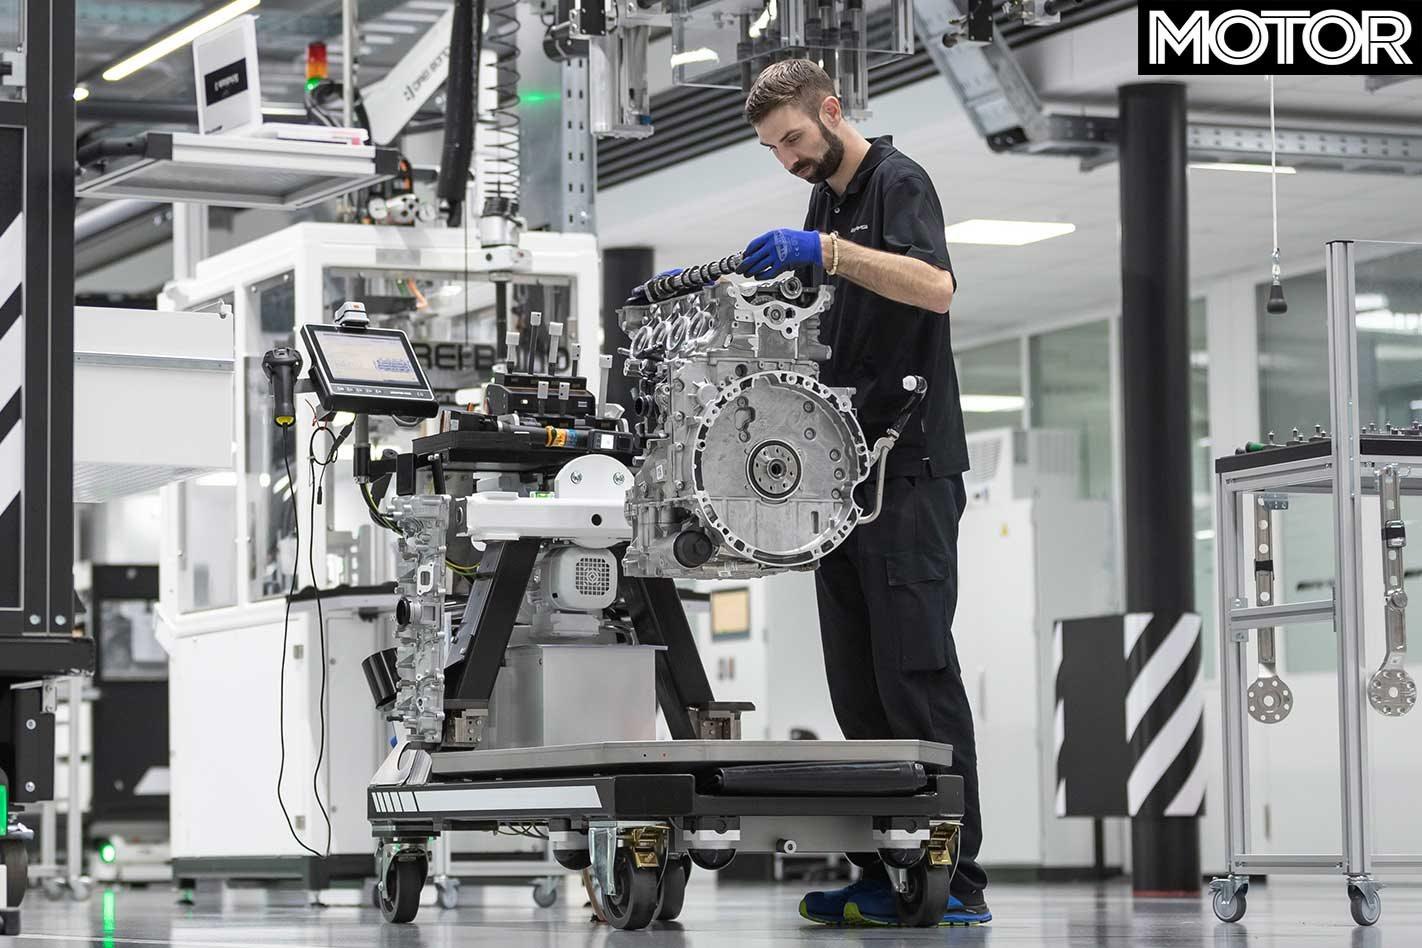 Mercedes-AMG's 310kW M139 engine explained: Geek Speak